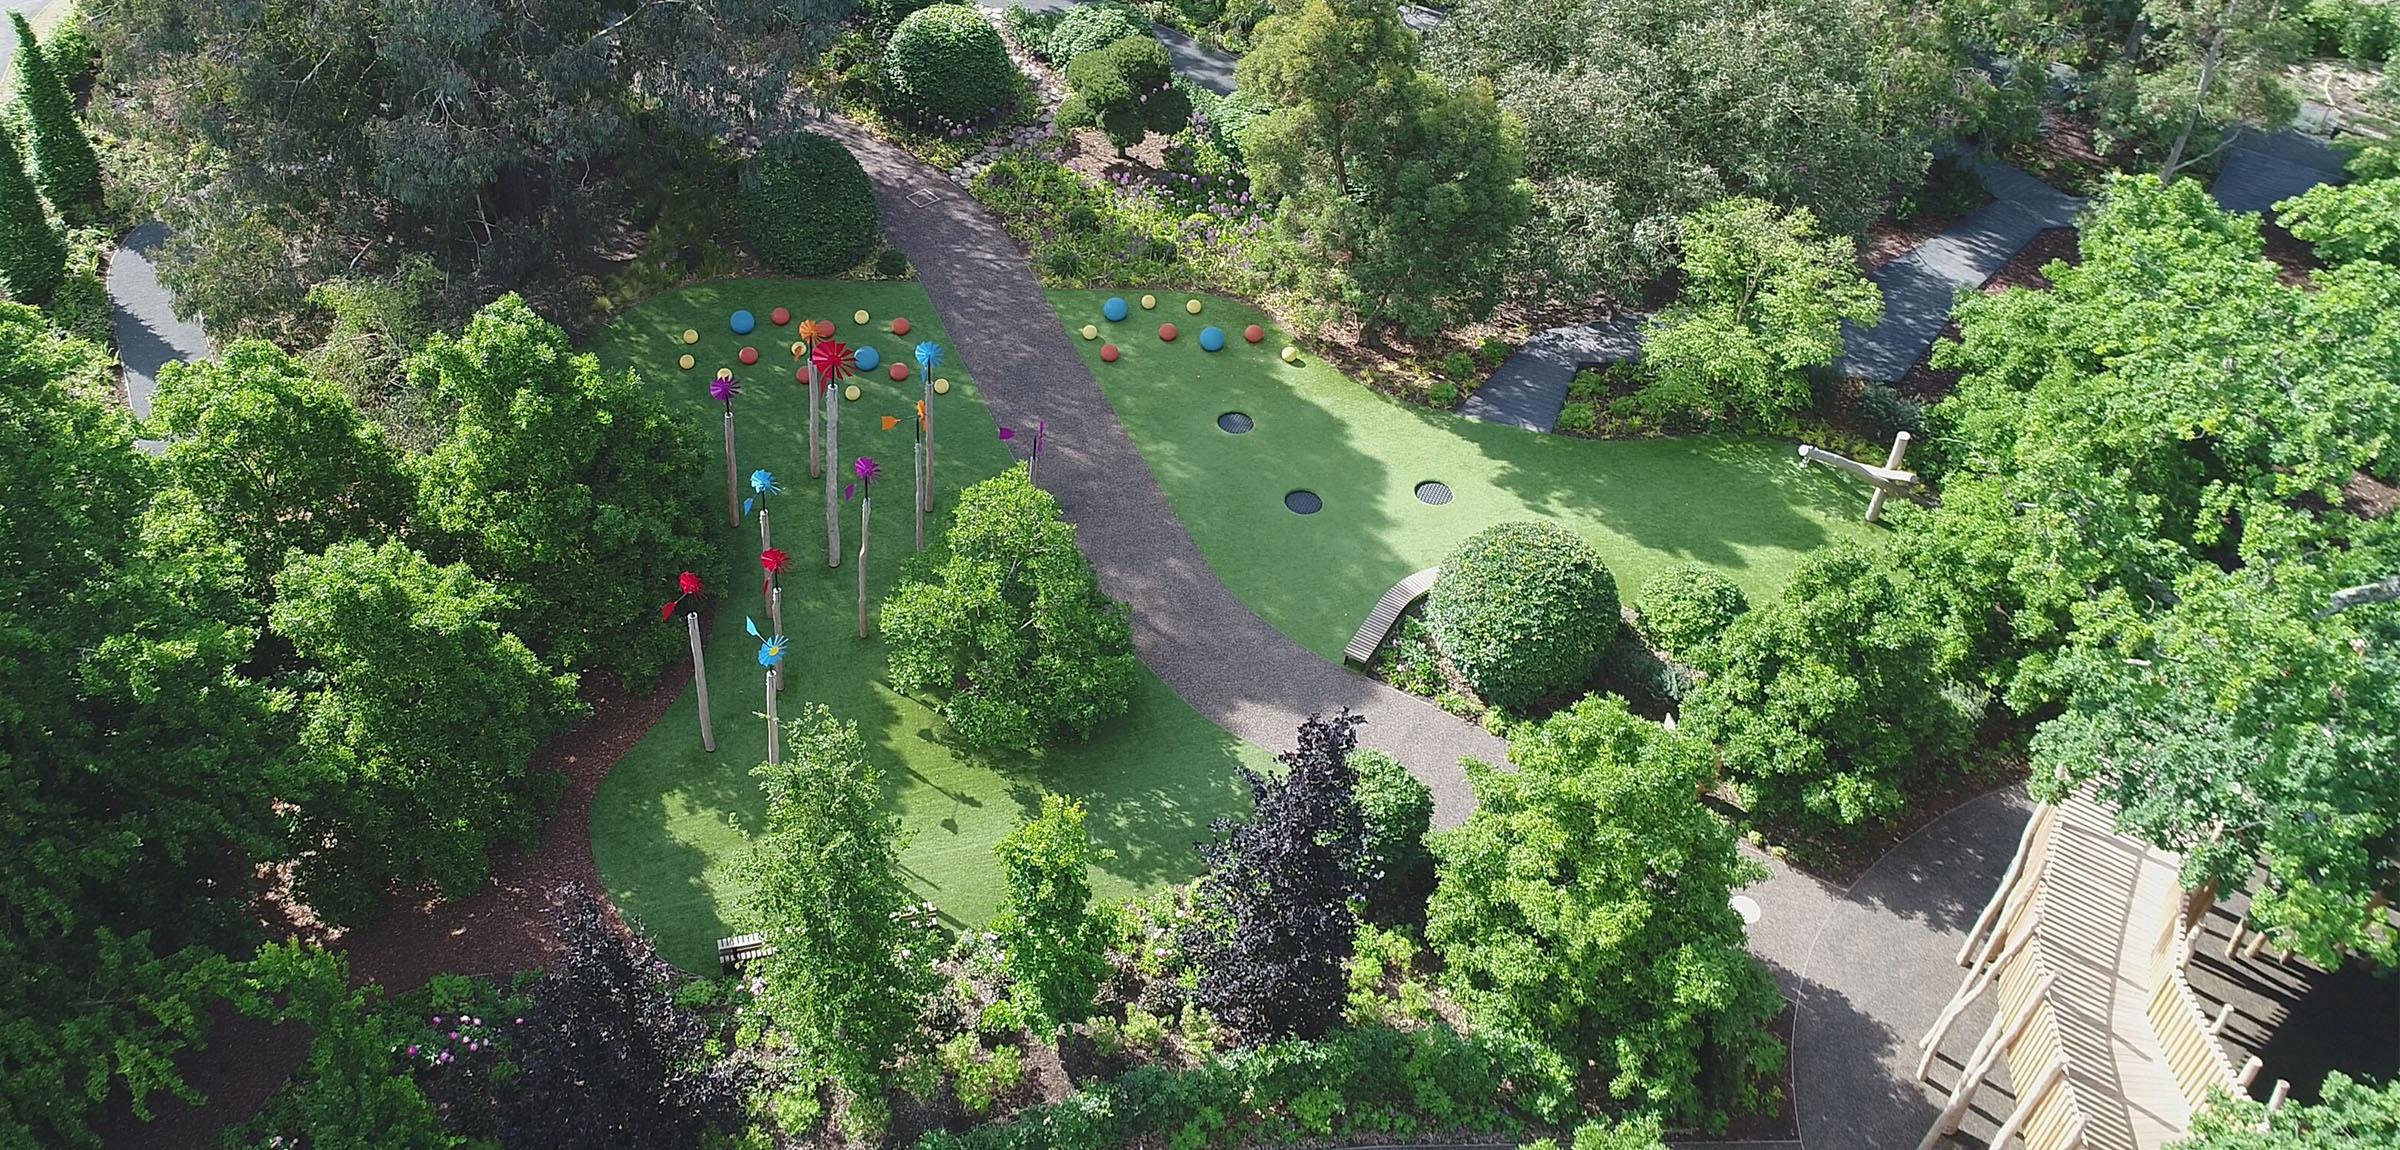 bespoke playgrounds kew gardens